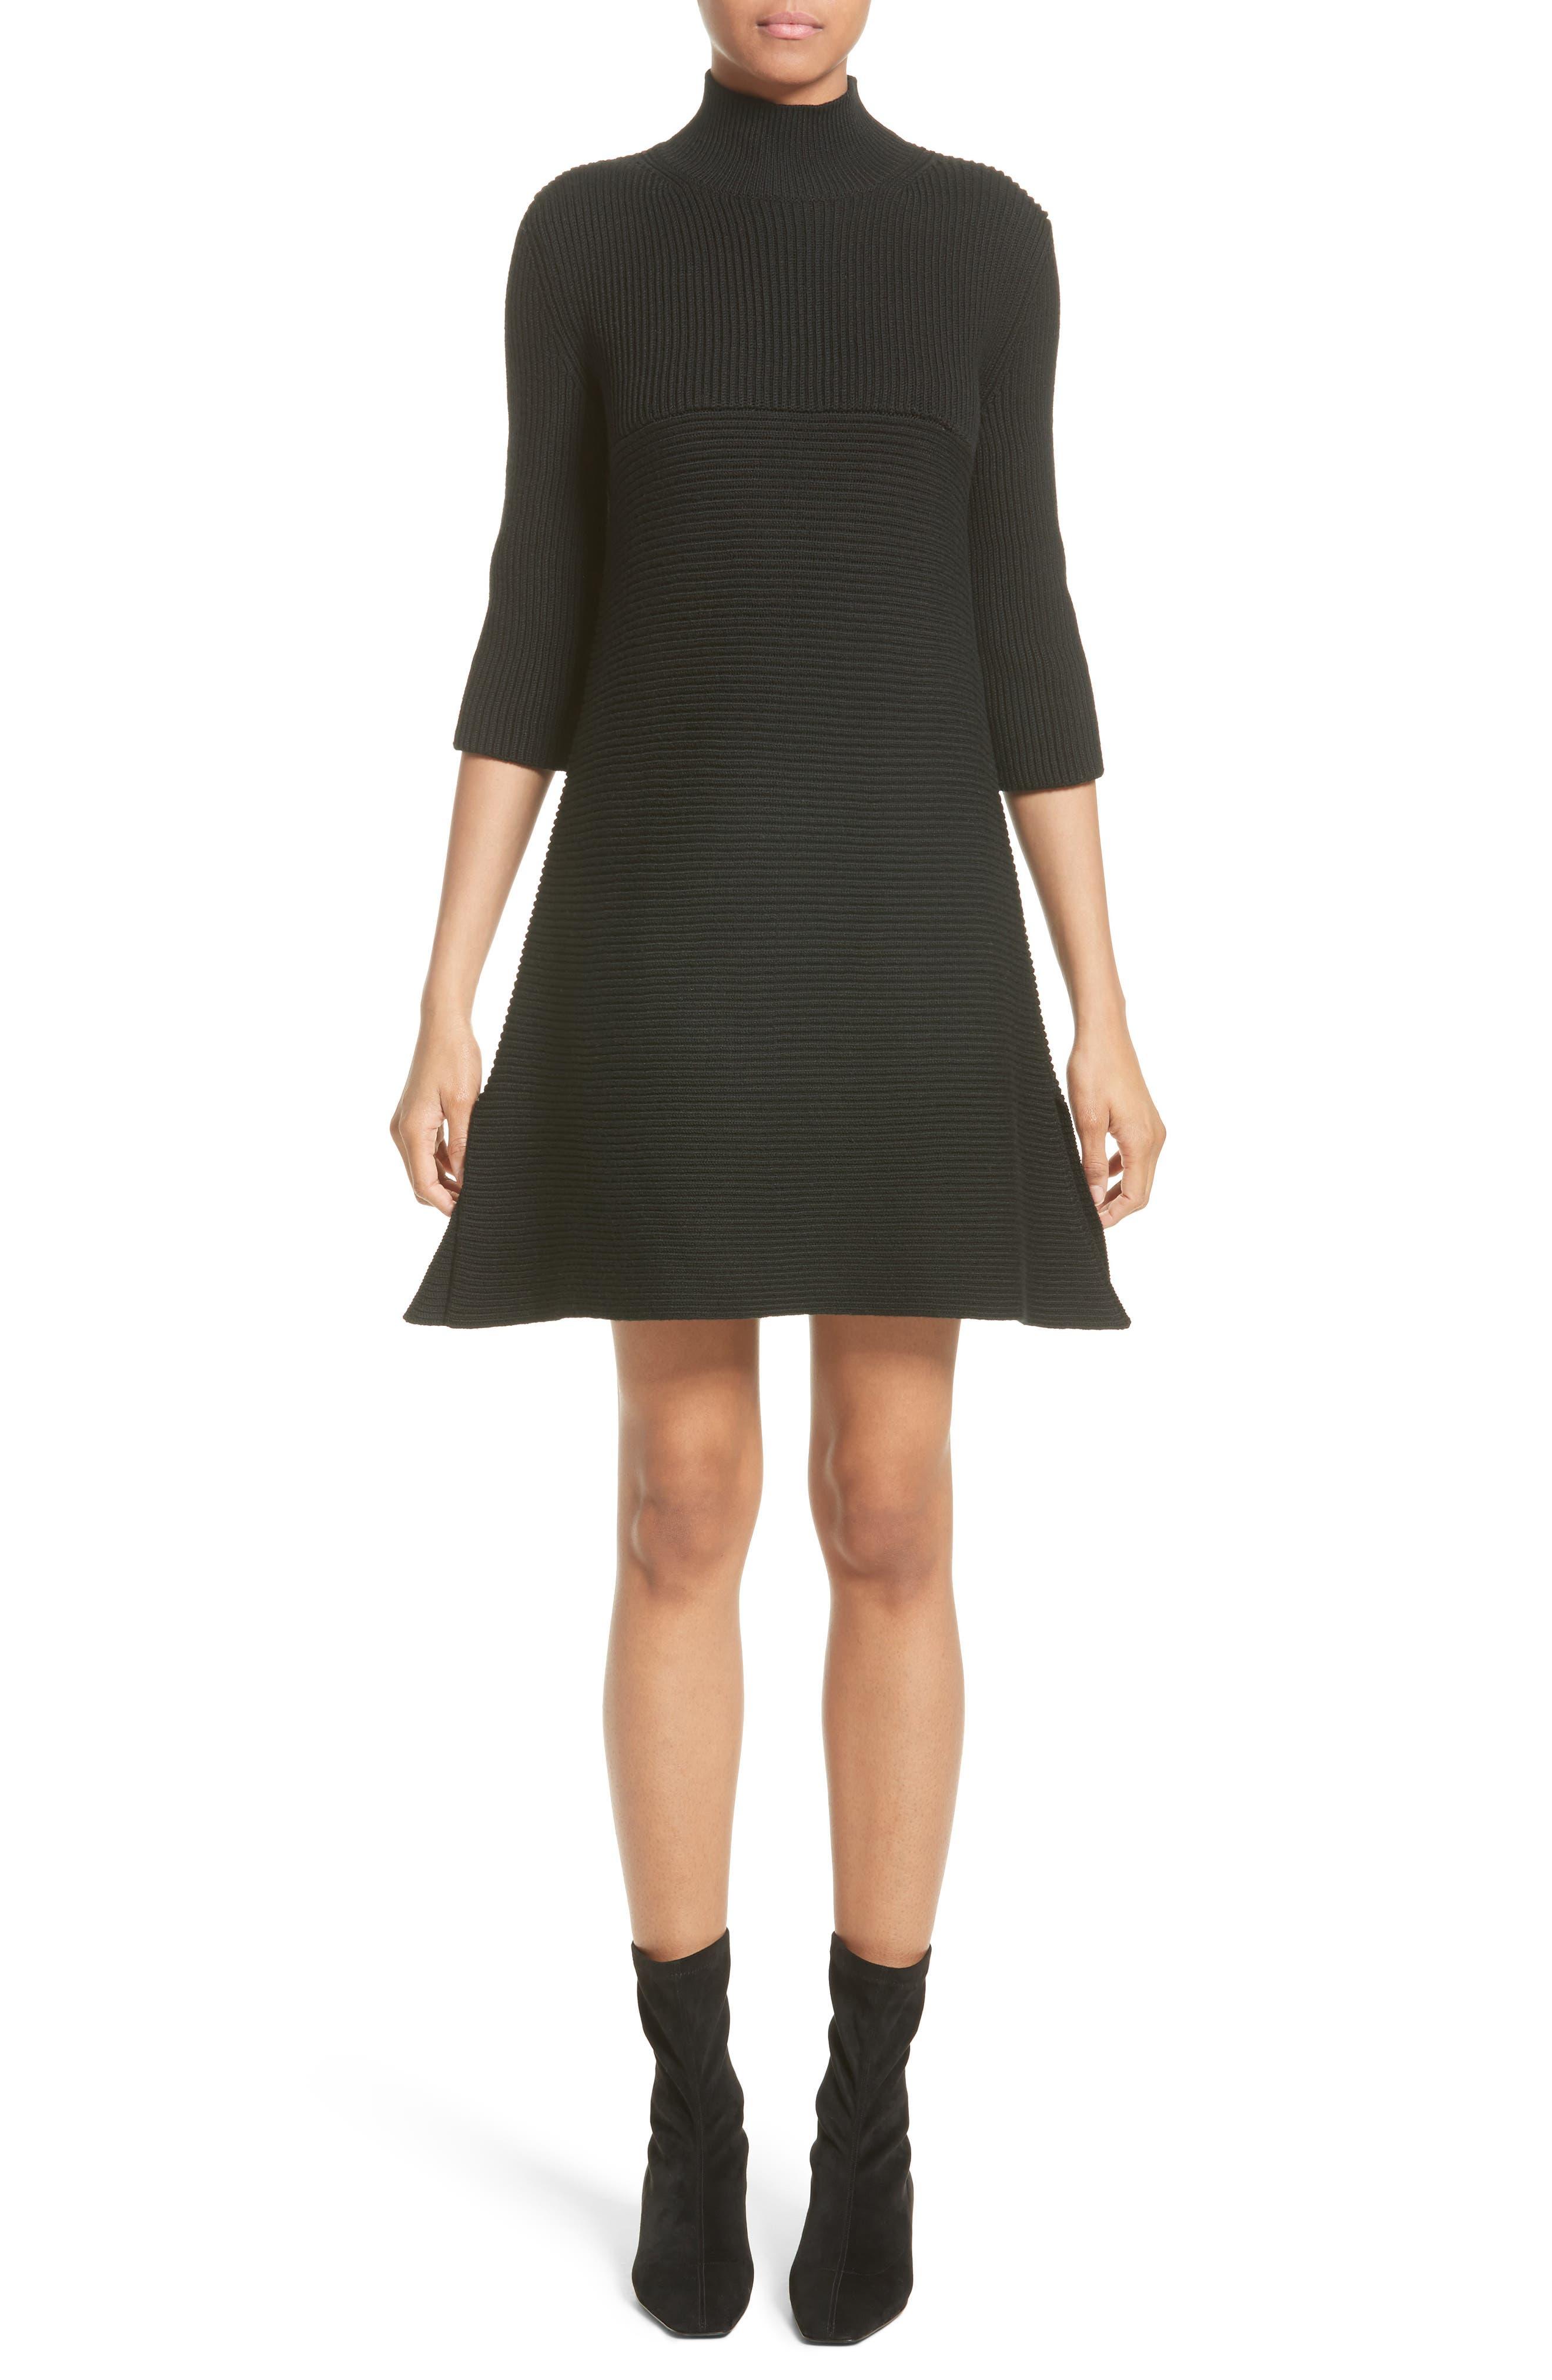 Virgin Wool Rib Knit Dress,                             Main thumbnail 1, color,                             001